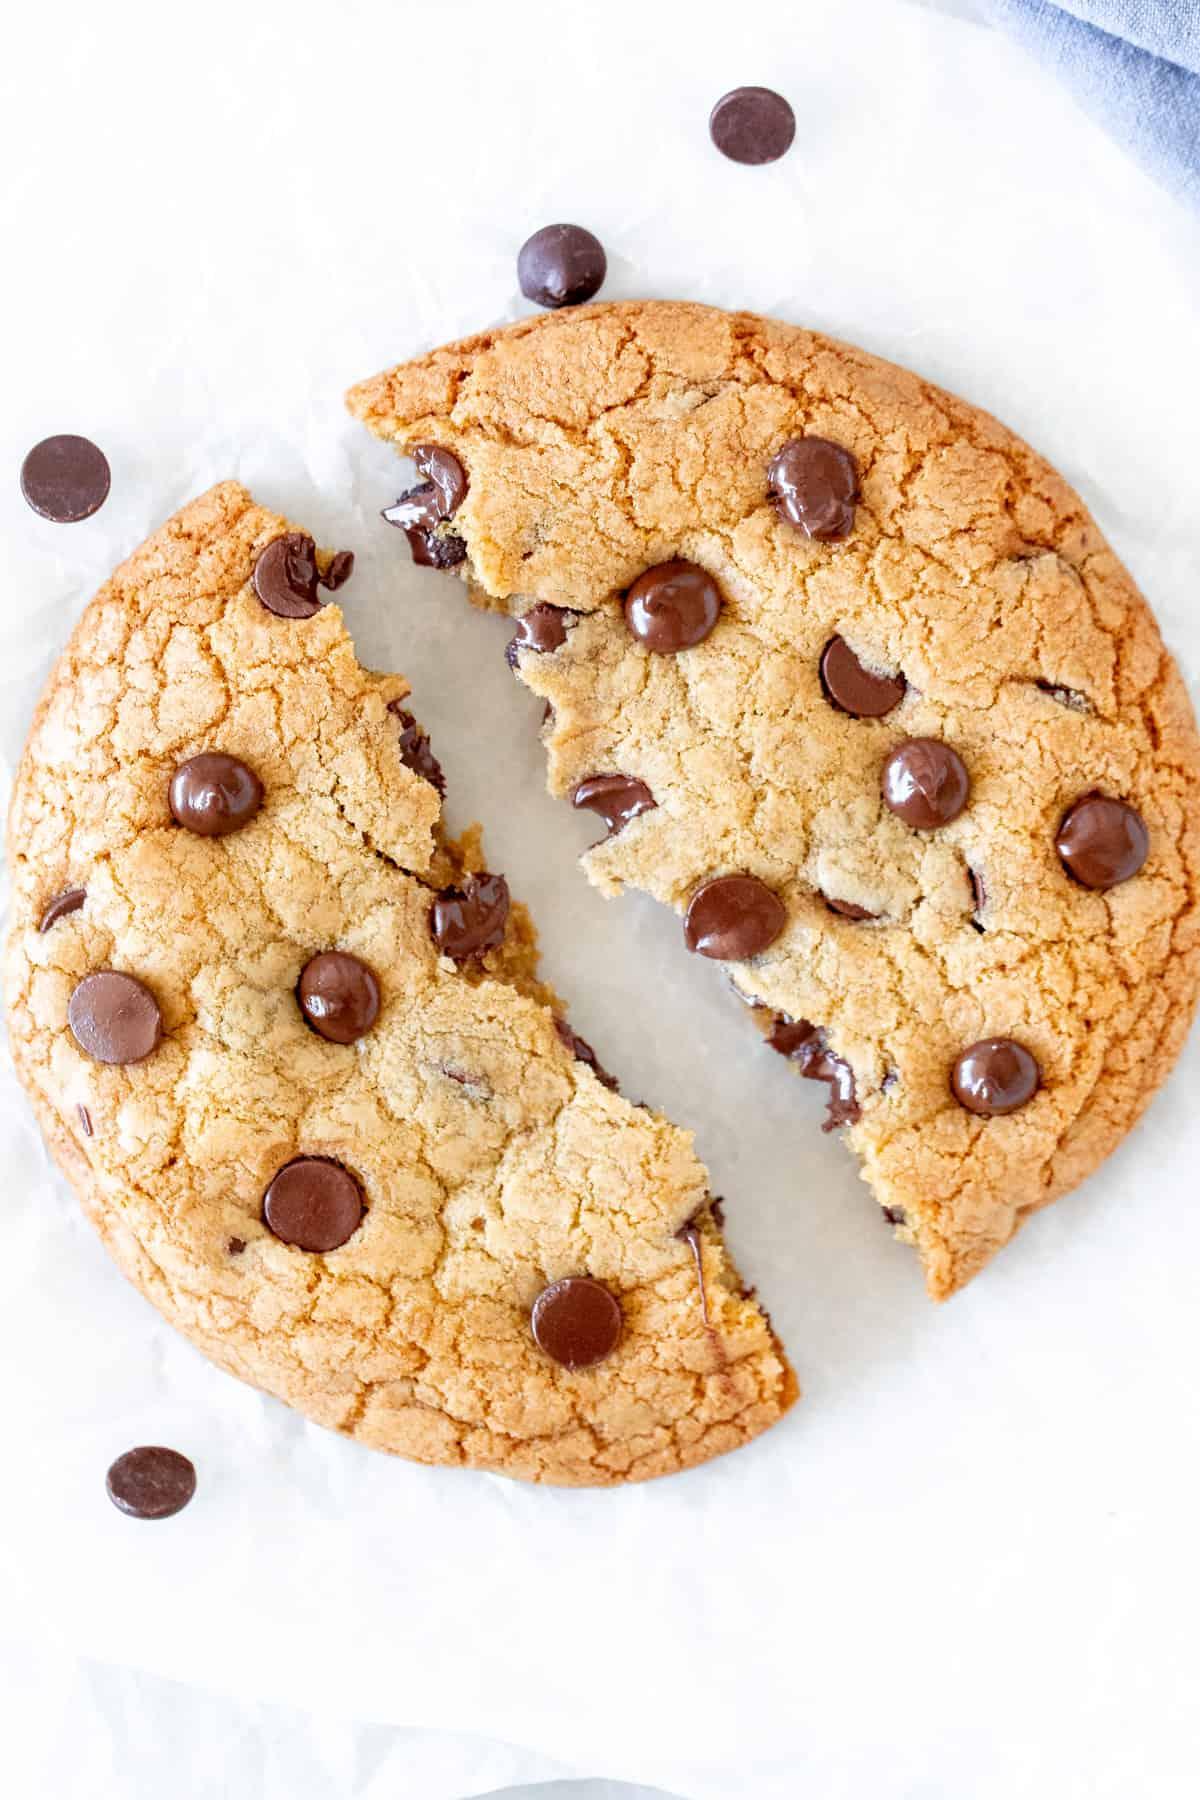 Single serving chocolate chip cookie broken in half